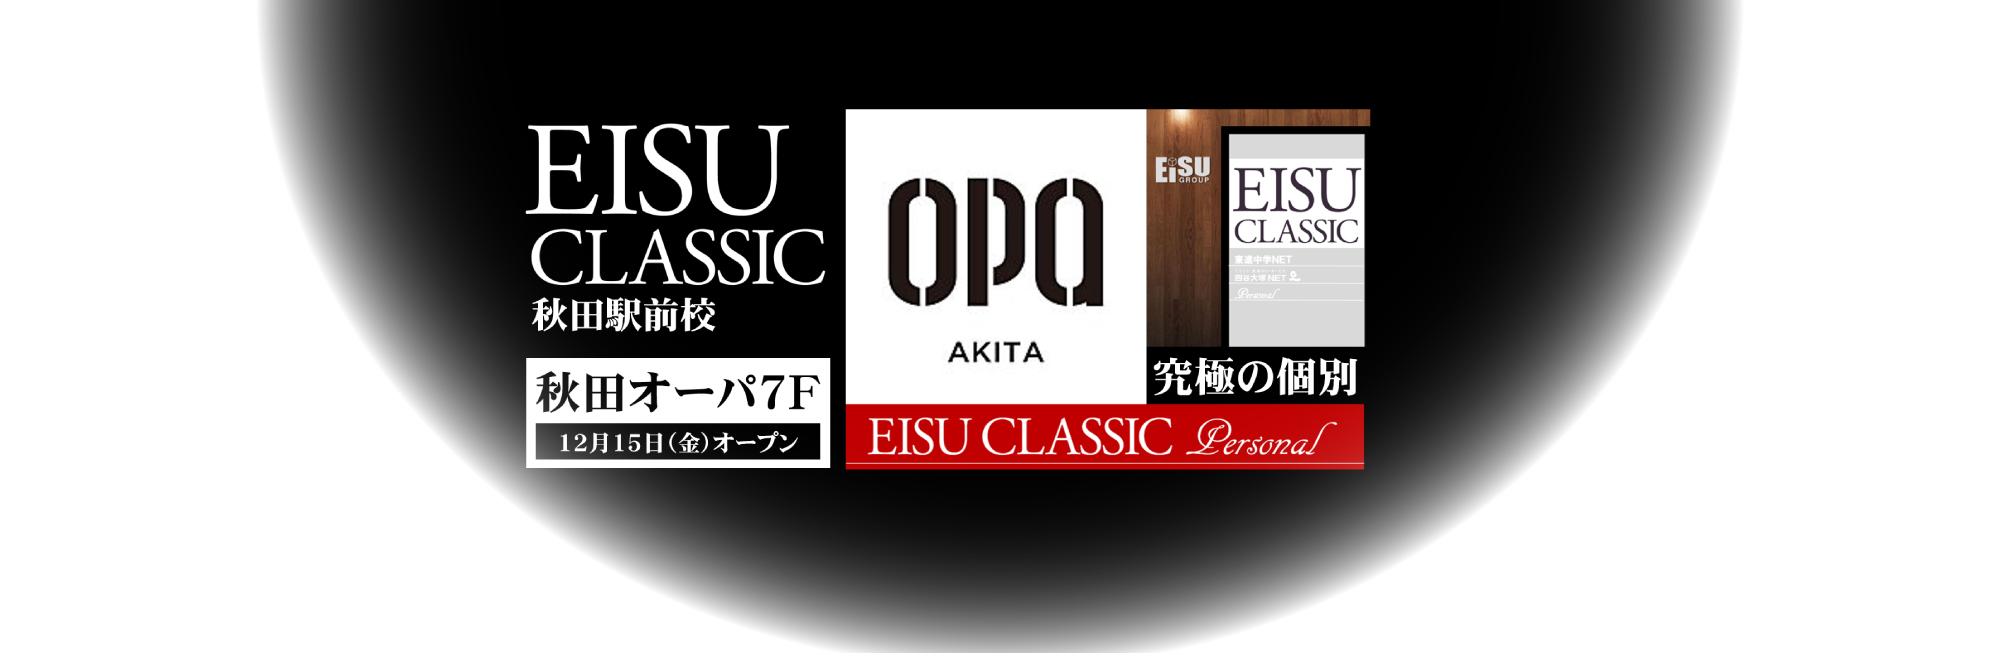 秋田駅前オーパ7F